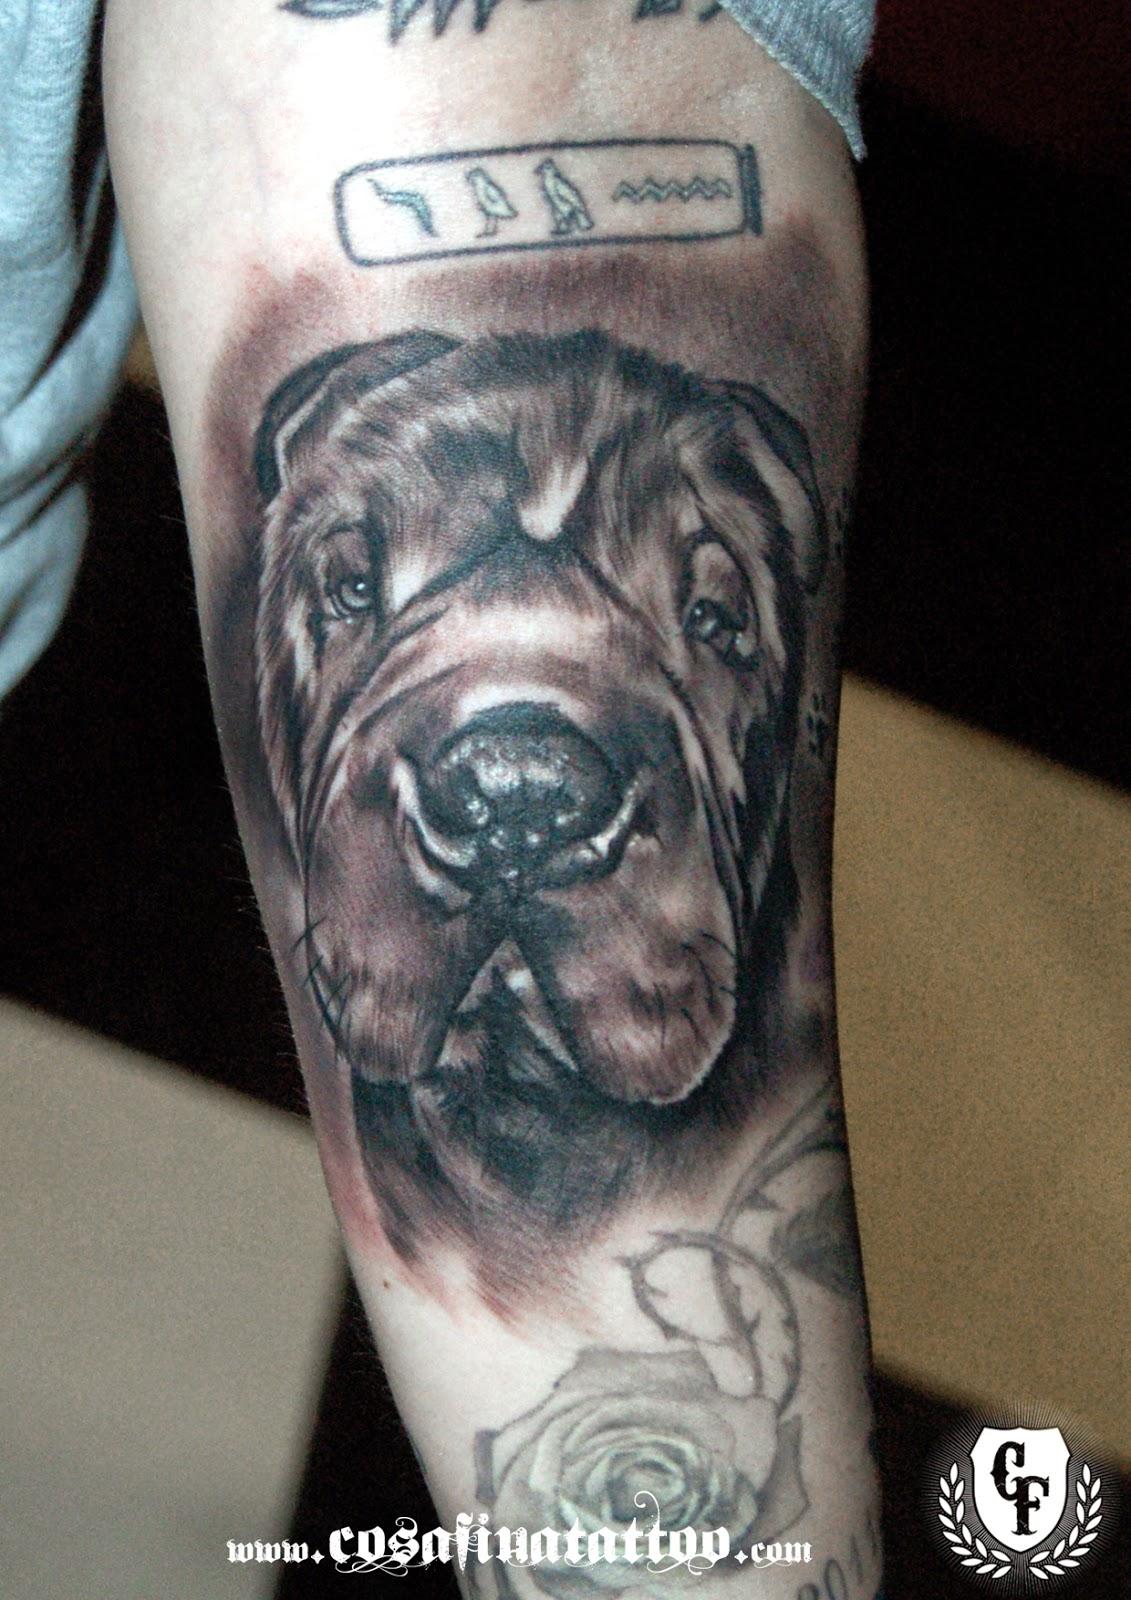 Tatuaje Carlos cosafina tattoo carlos art studio: tatuaje retrato perro realista